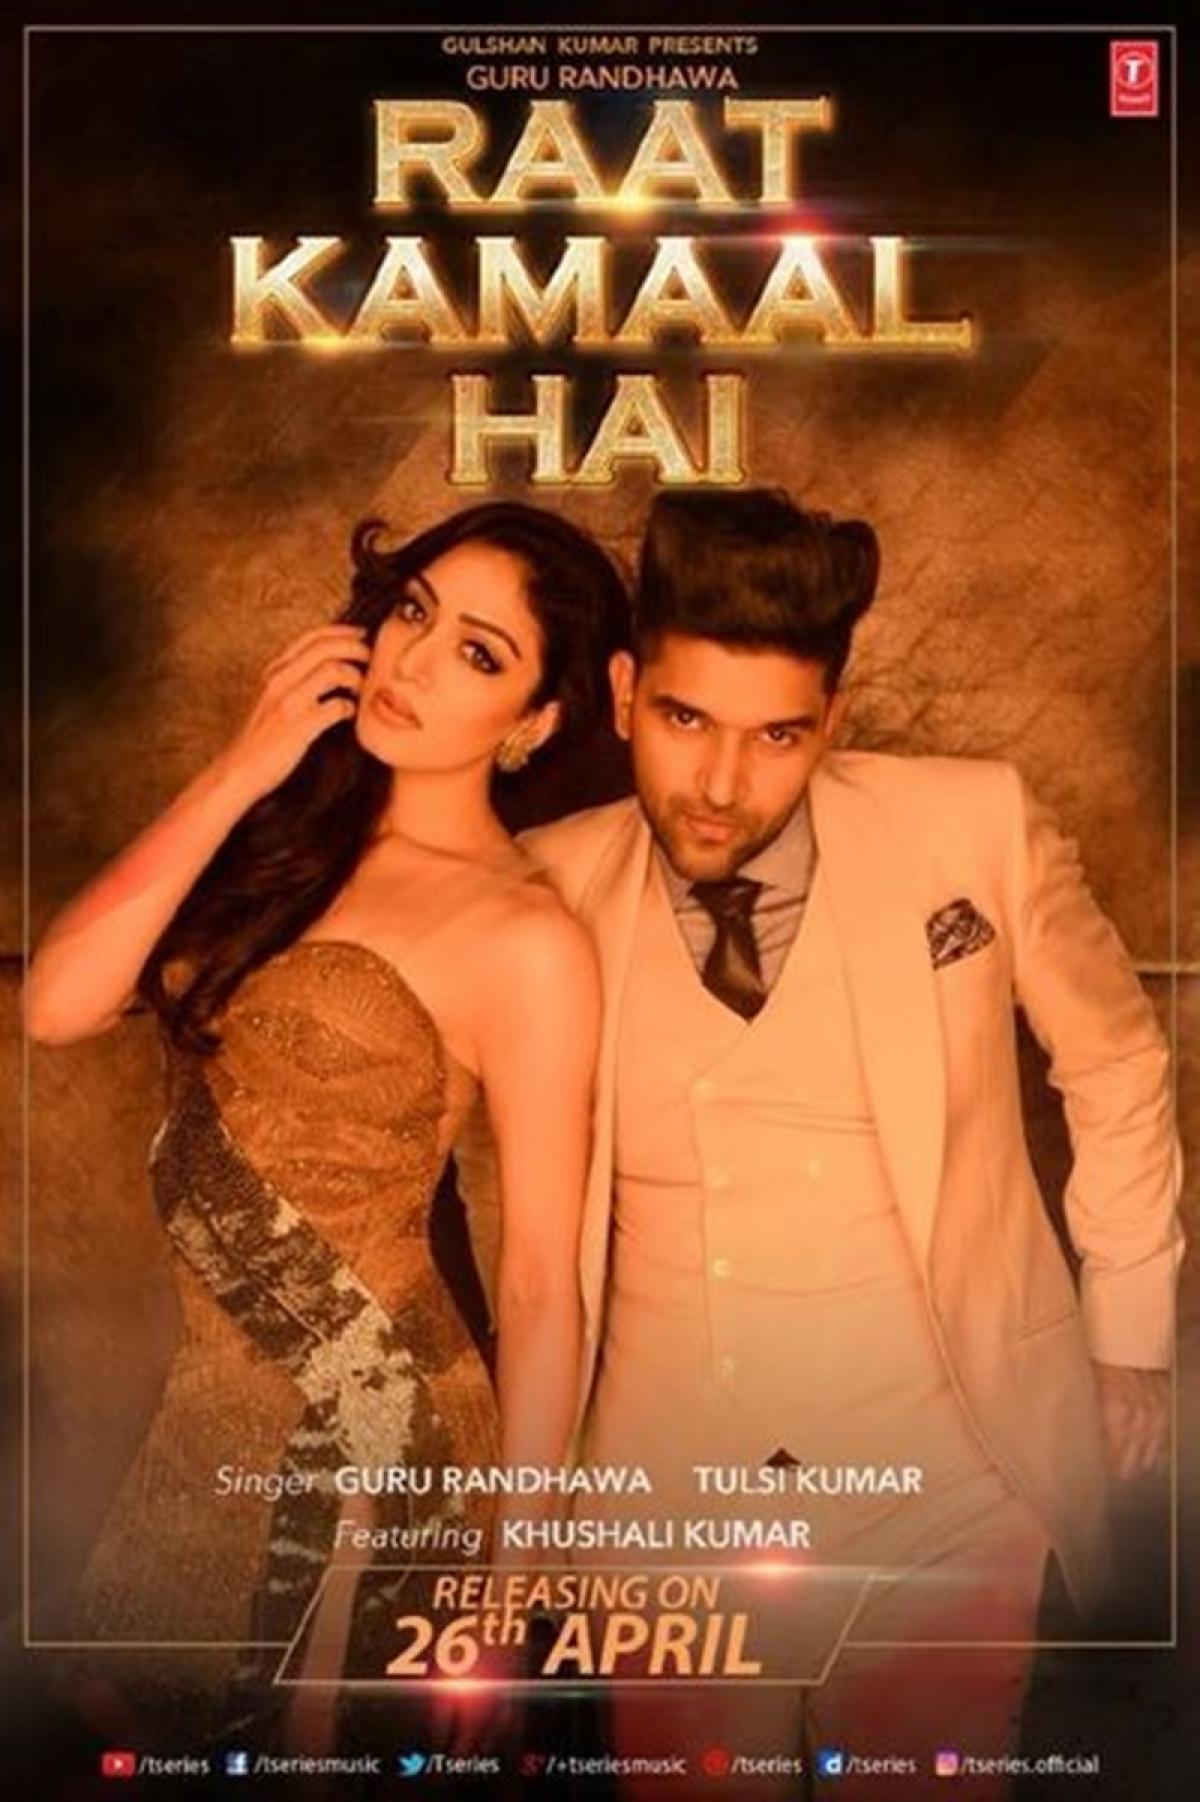 Artist Guru Randhava's new song 'Raat Kamaal Hai' is out and already has more than 1,000,000 views